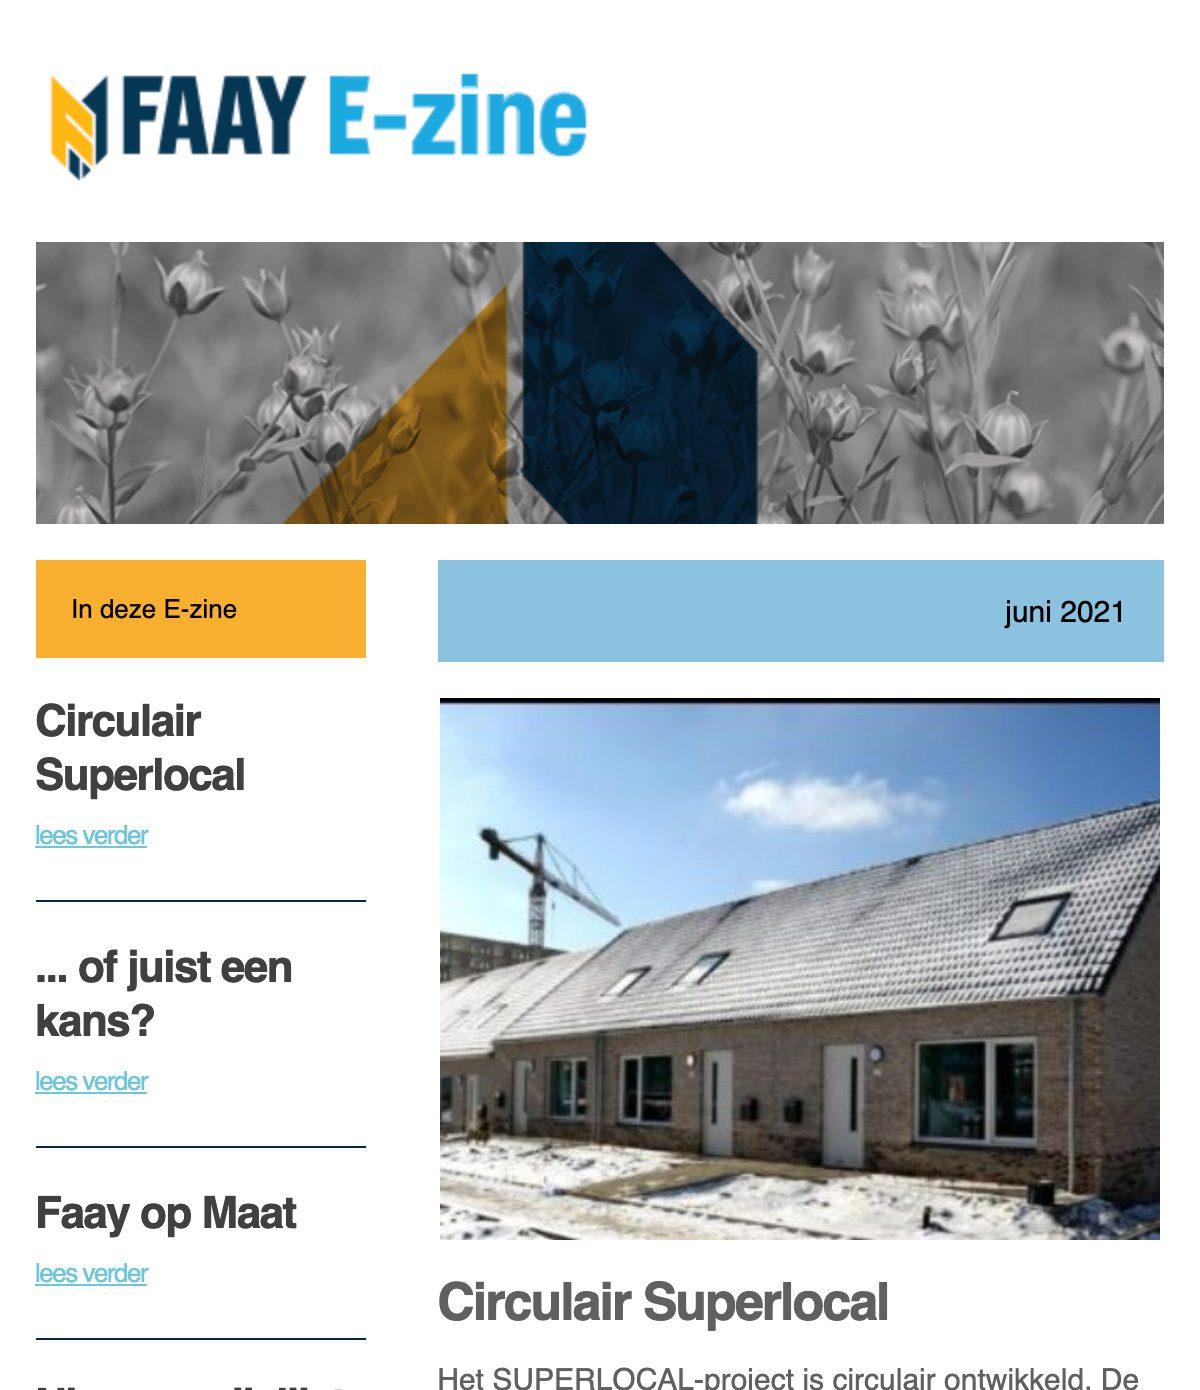 Ezine-nieuwsbrief-faay